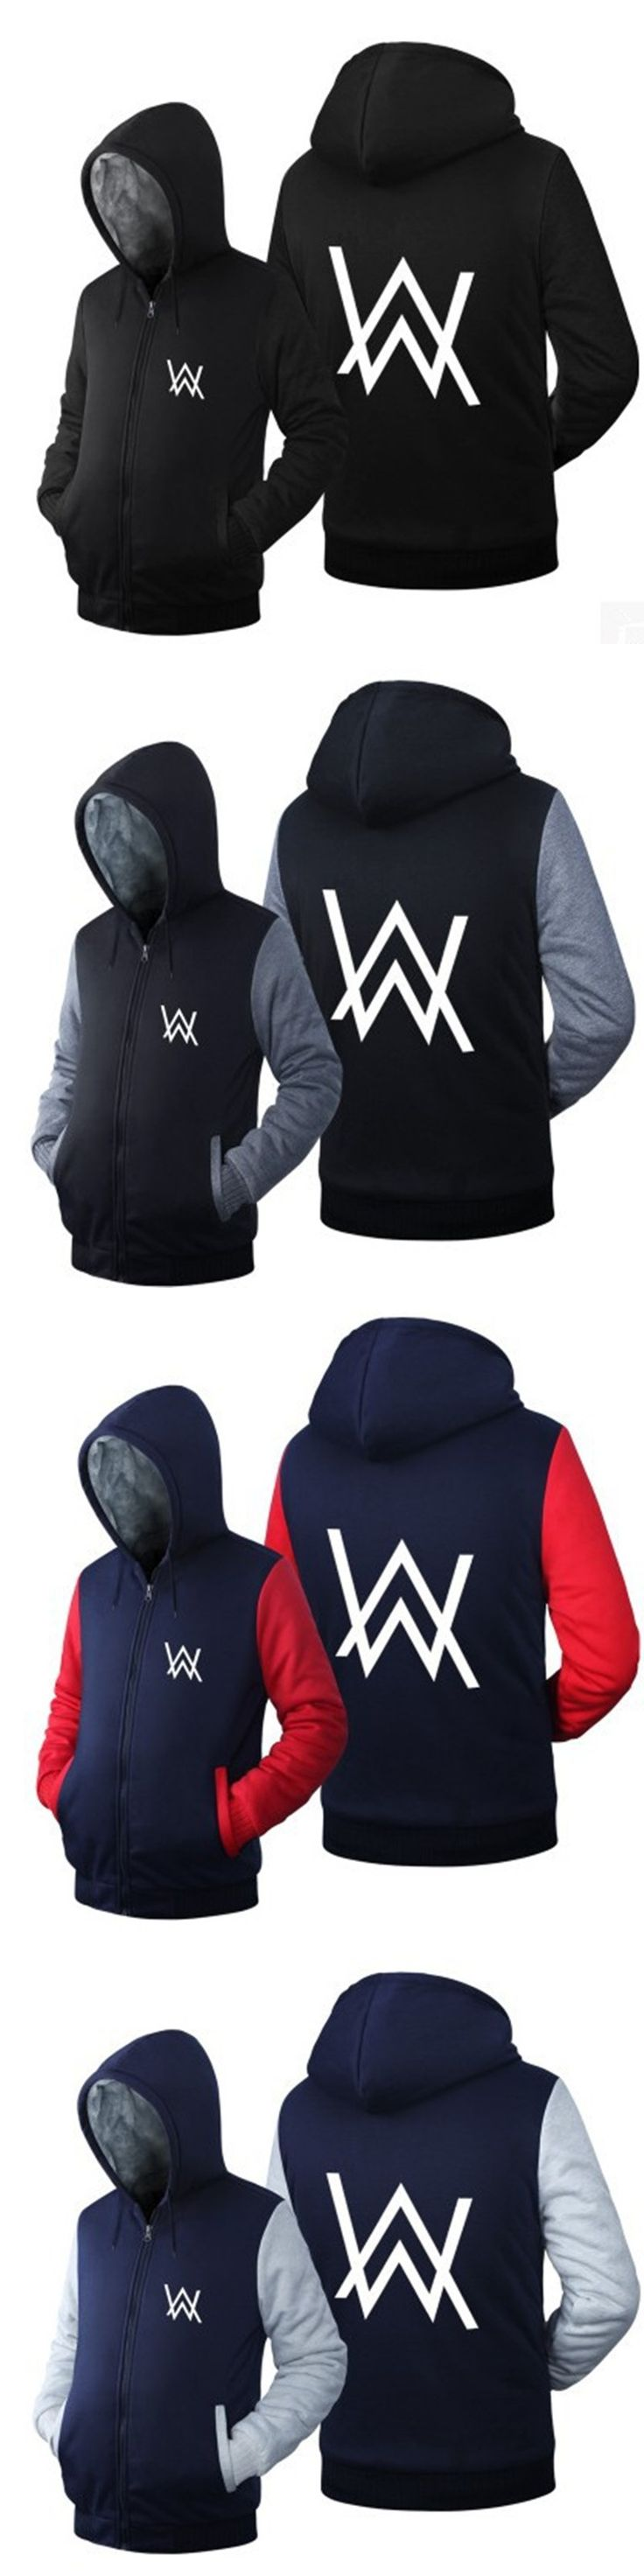 The 955 Best Alan Walker Images On Pinterest Dj And Jaket Sweater Zipper 2017 New Sweatshirts Winter Fleece Hoodies Pure Cotton Faded Electric Hoodie